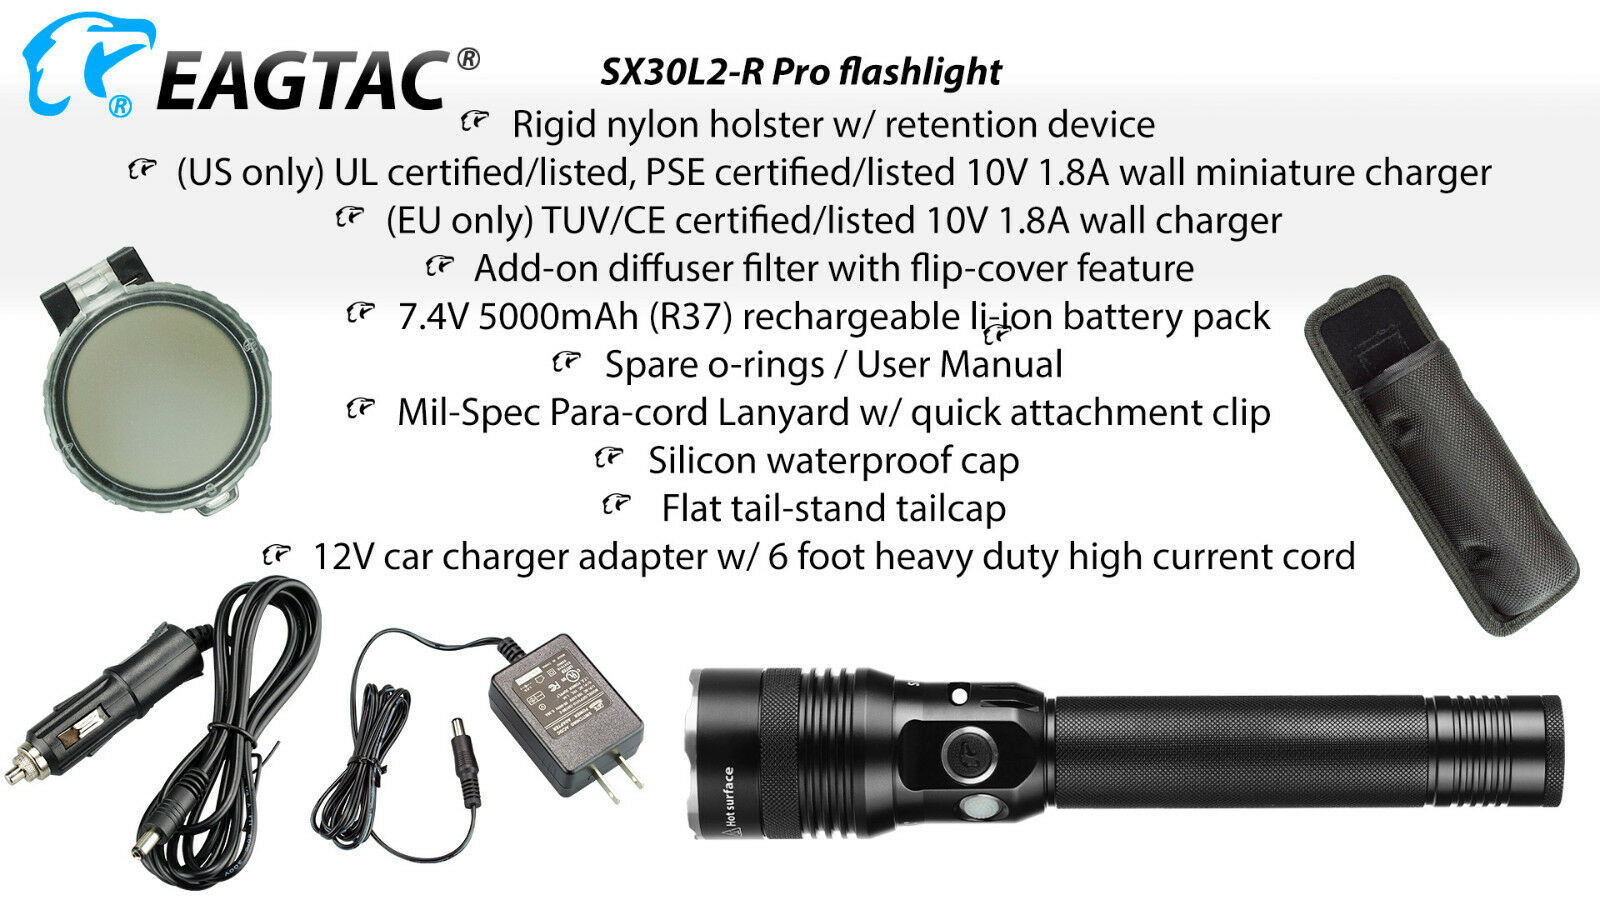 Eagletac Eagletac Eagletac SX30L2-R Pro Rechargeable Flashlight 2000 Lumen - CREE XHP35 HD E4 CW 8edd5b